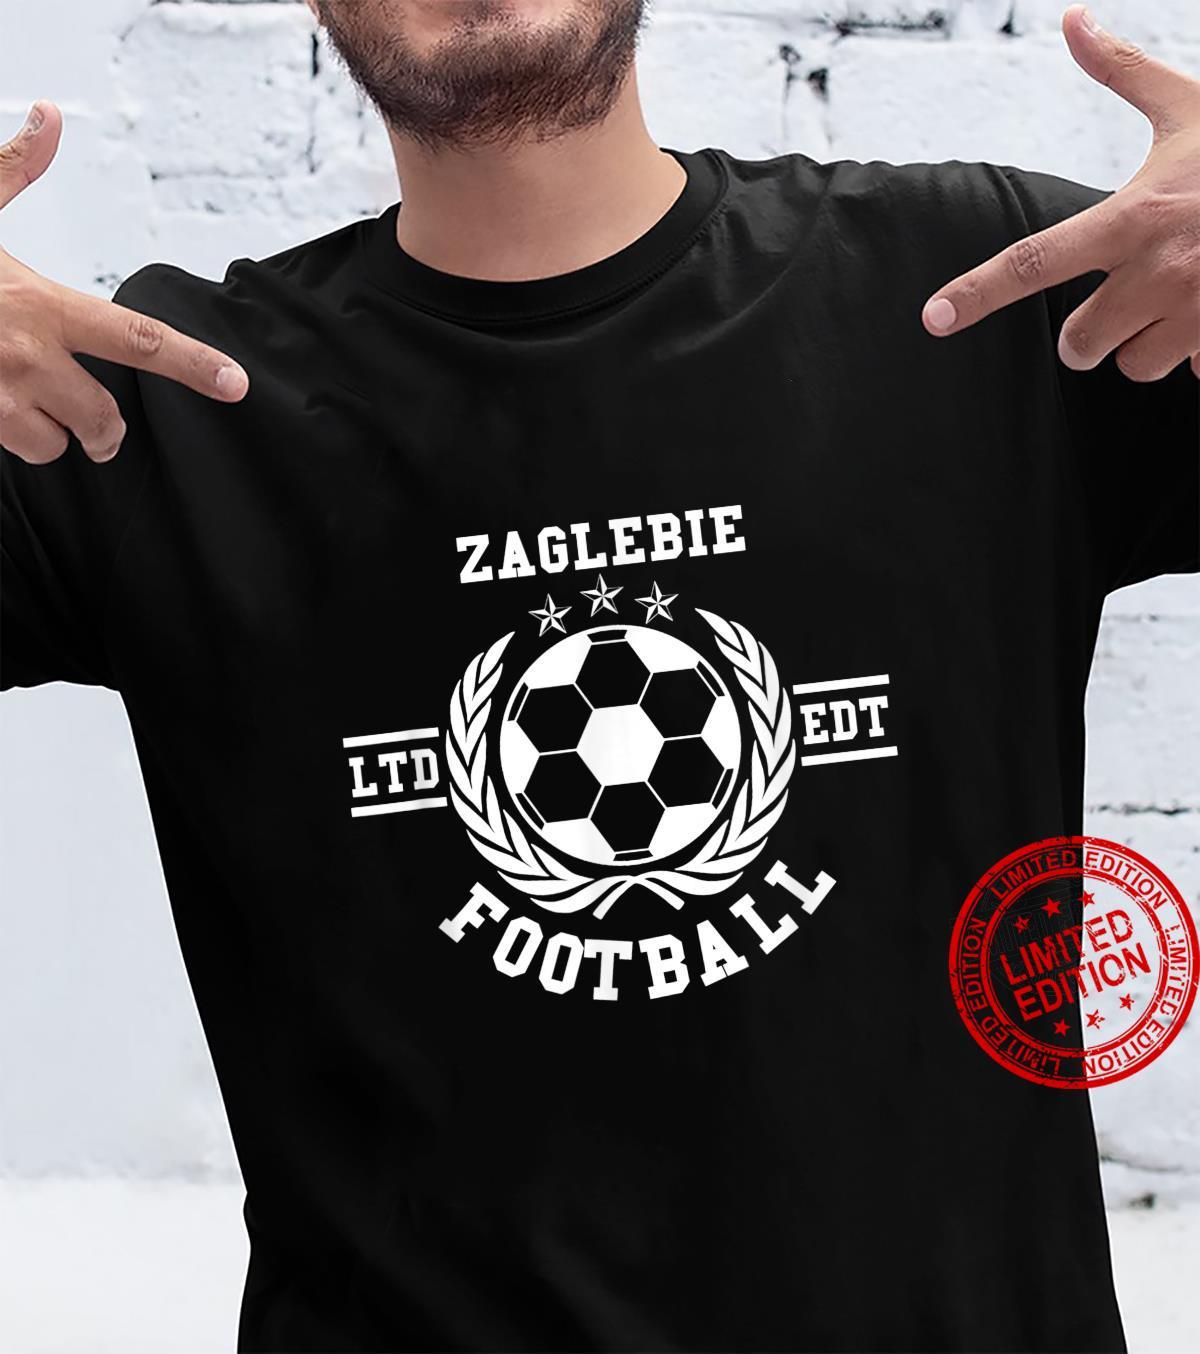 Zaglebie Soccer Jersey Shirt